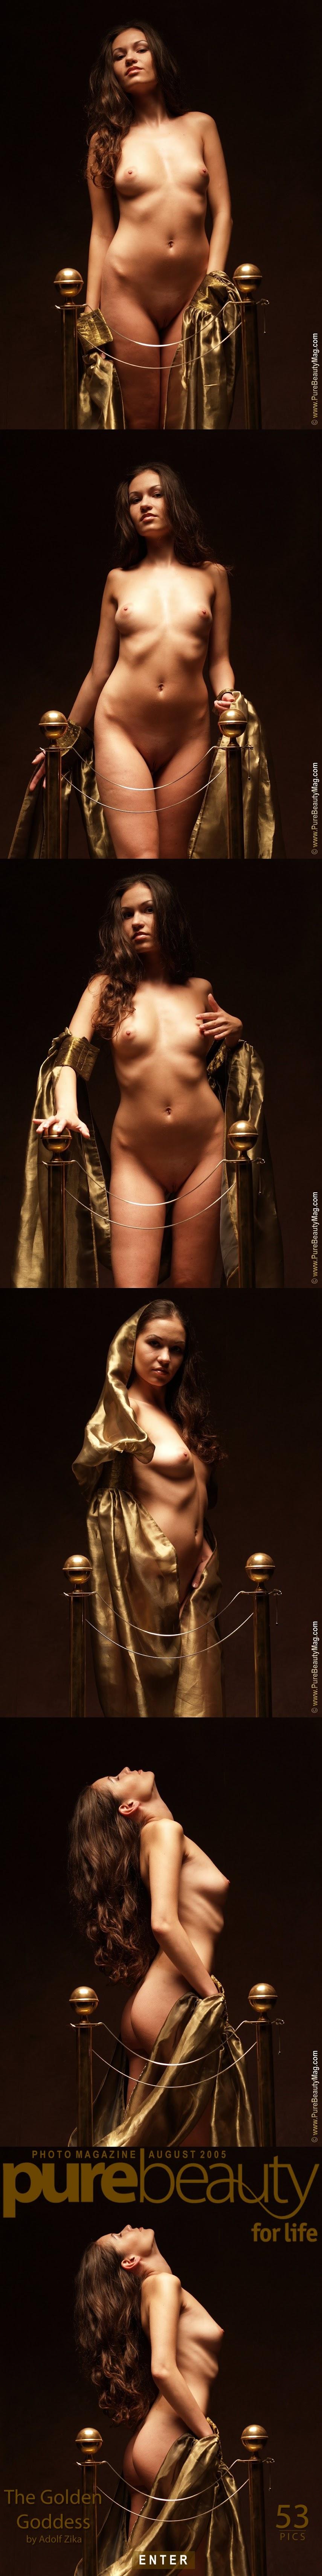 PureBeautyMag PBM  - 2005-08-13 -  s105550 - Erika Nasticka - The Golden Goddess - 2560px